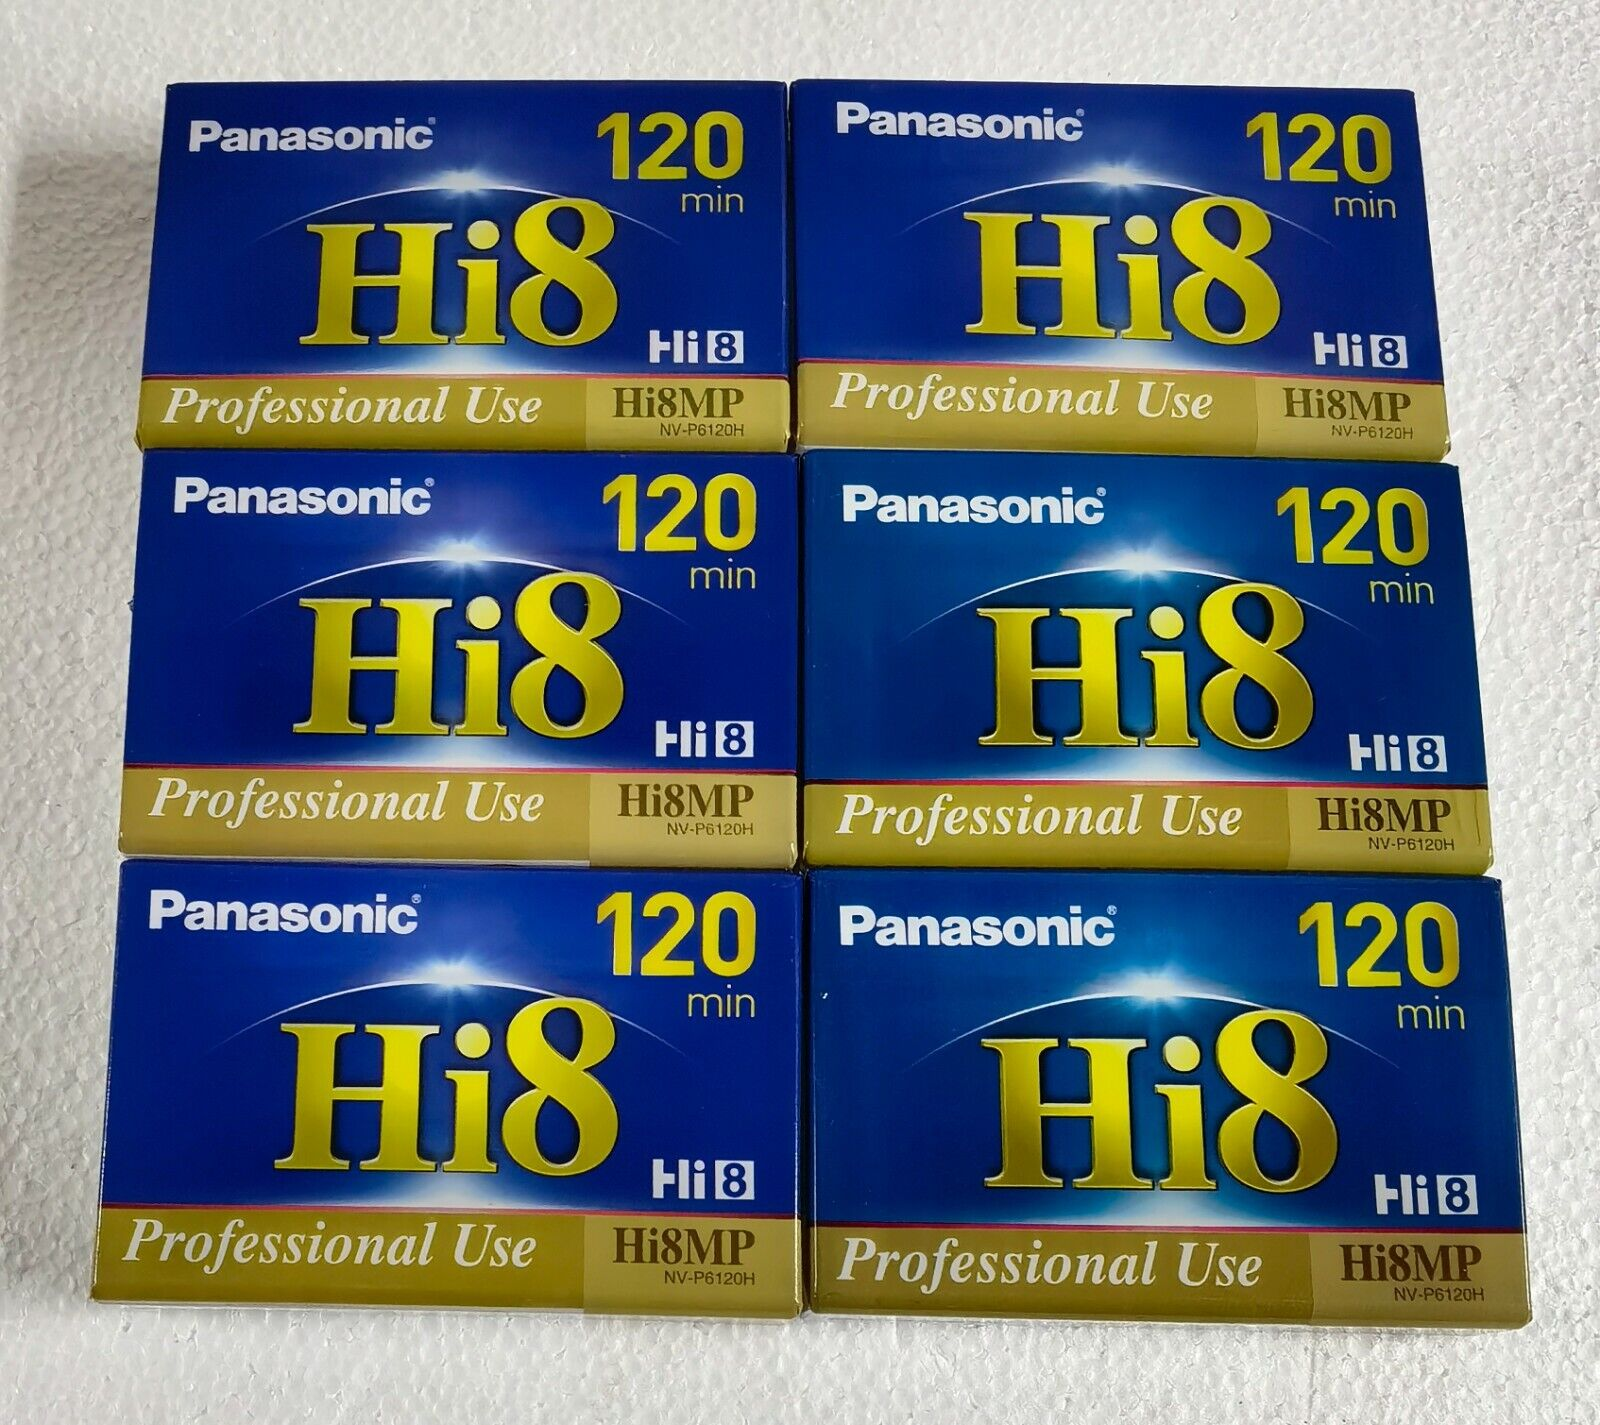 6 PANASONIC 8MM CAMCORDER VIDEO TAPE HI8 120 PROFESSIONAL USE HI8MP